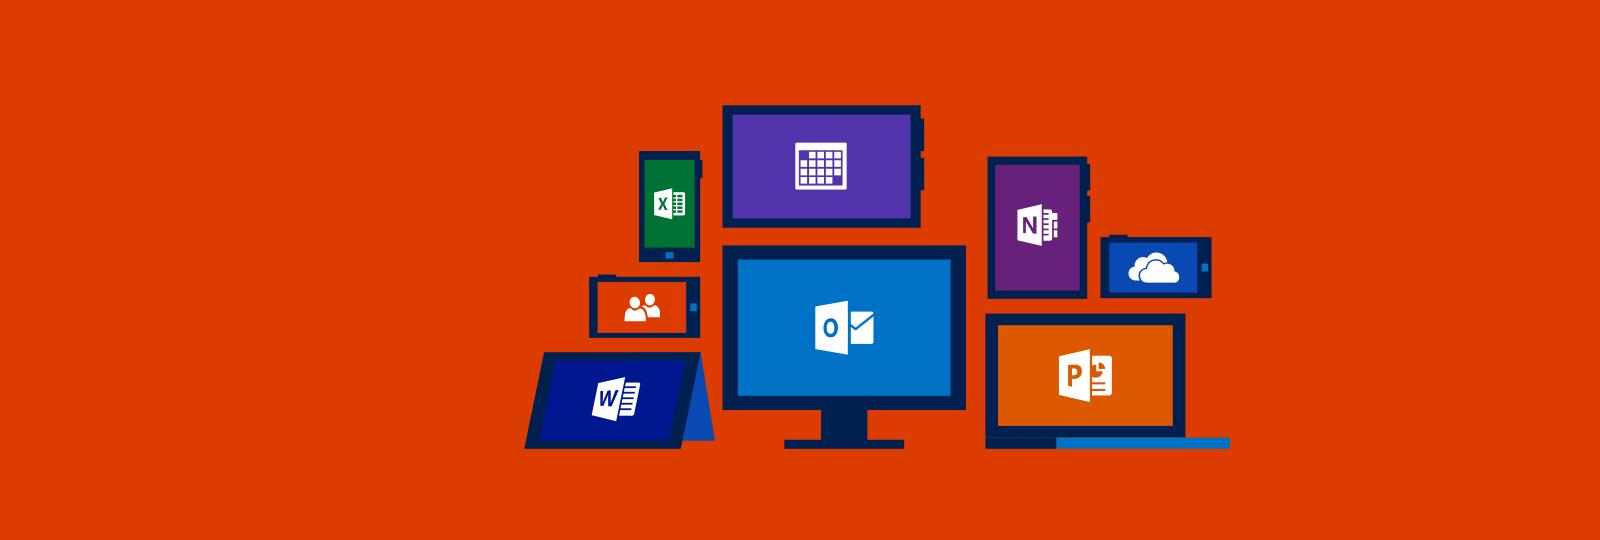 microsoft-office-365-logo2